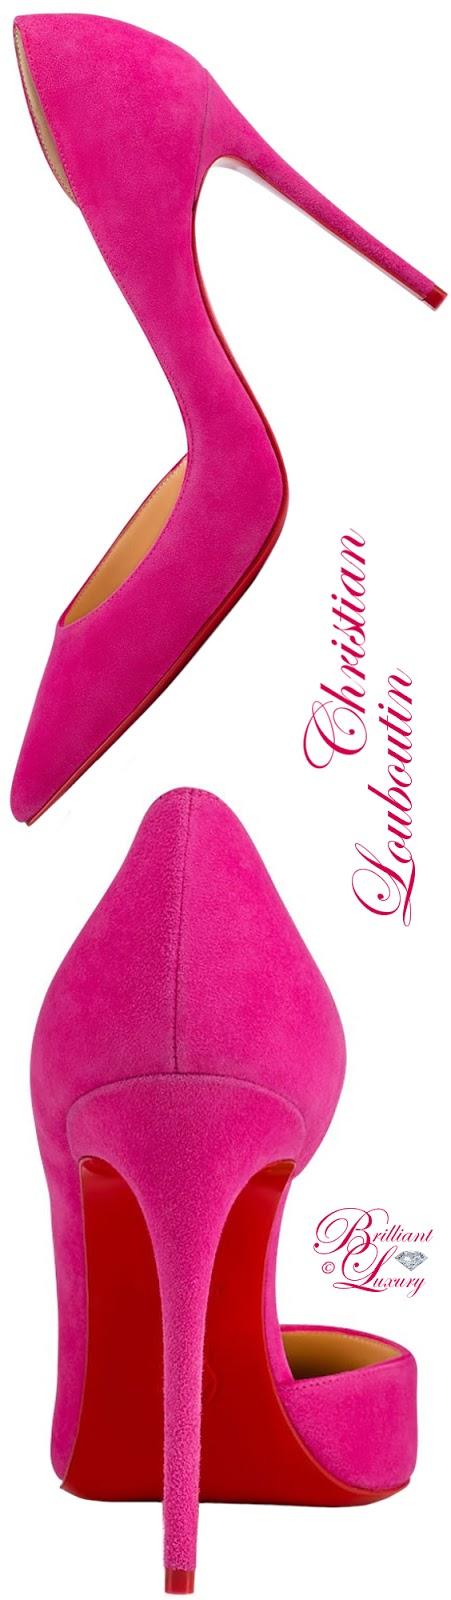 Brilliant Luxury ♦ Christian Louboutin Iriza Suede Pump